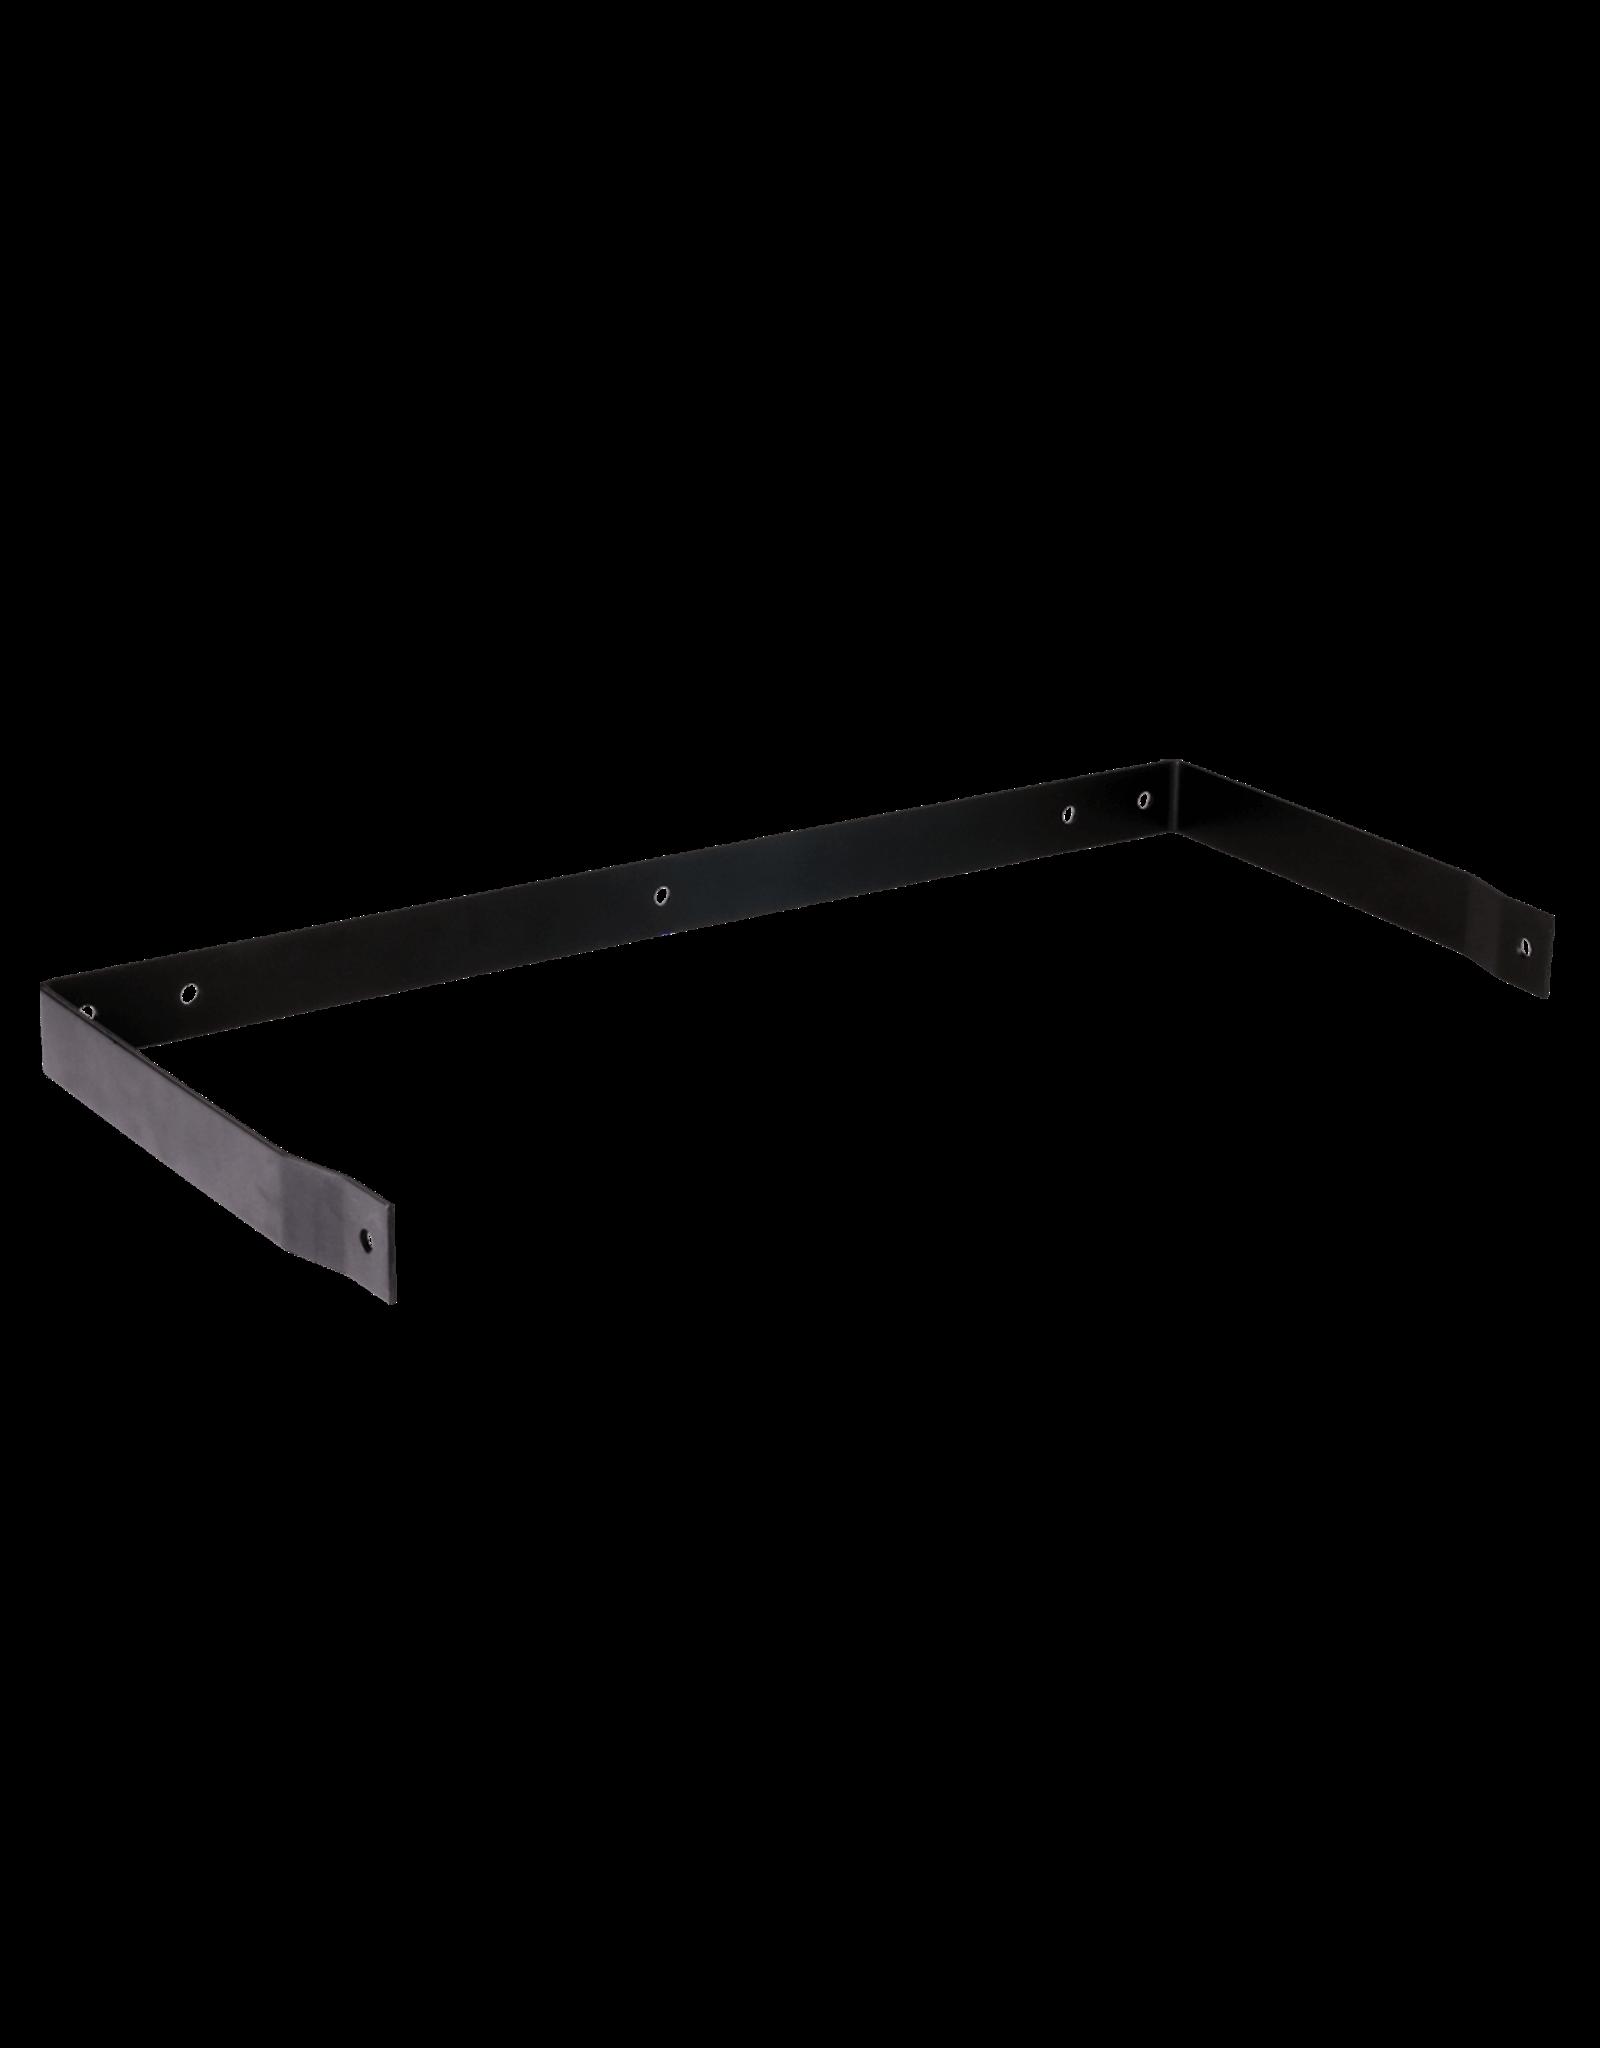 Audac Mounting bracket for PX112 speaker Black version